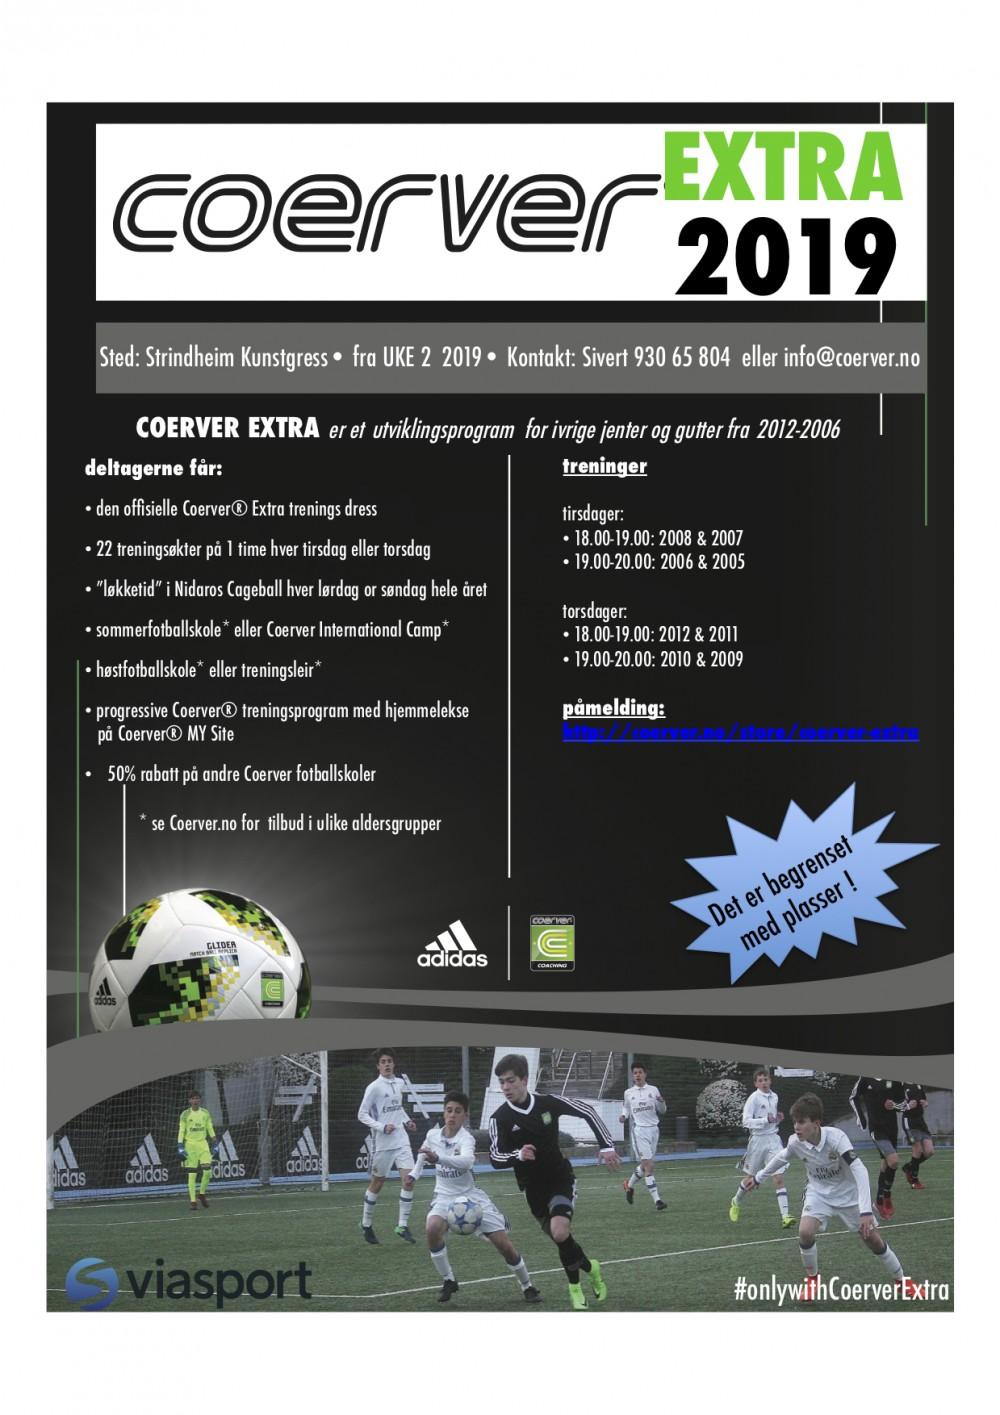 Coerver Extra Trondheim 2019 - født 2006